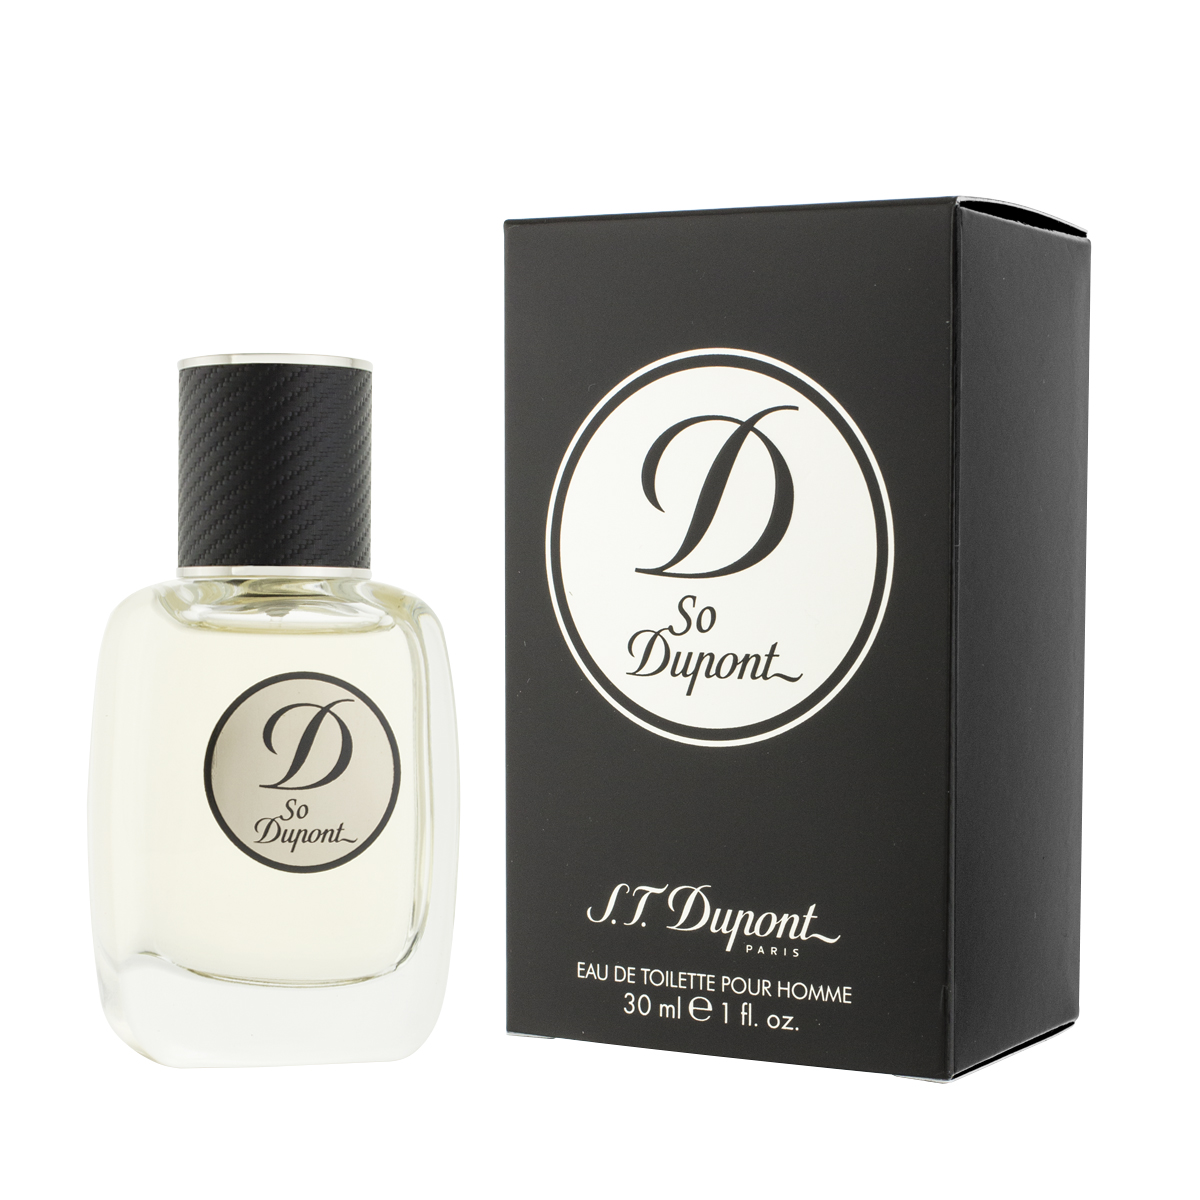 S.T. Dupont So Dupont Pour Homme EDT 30 ml M